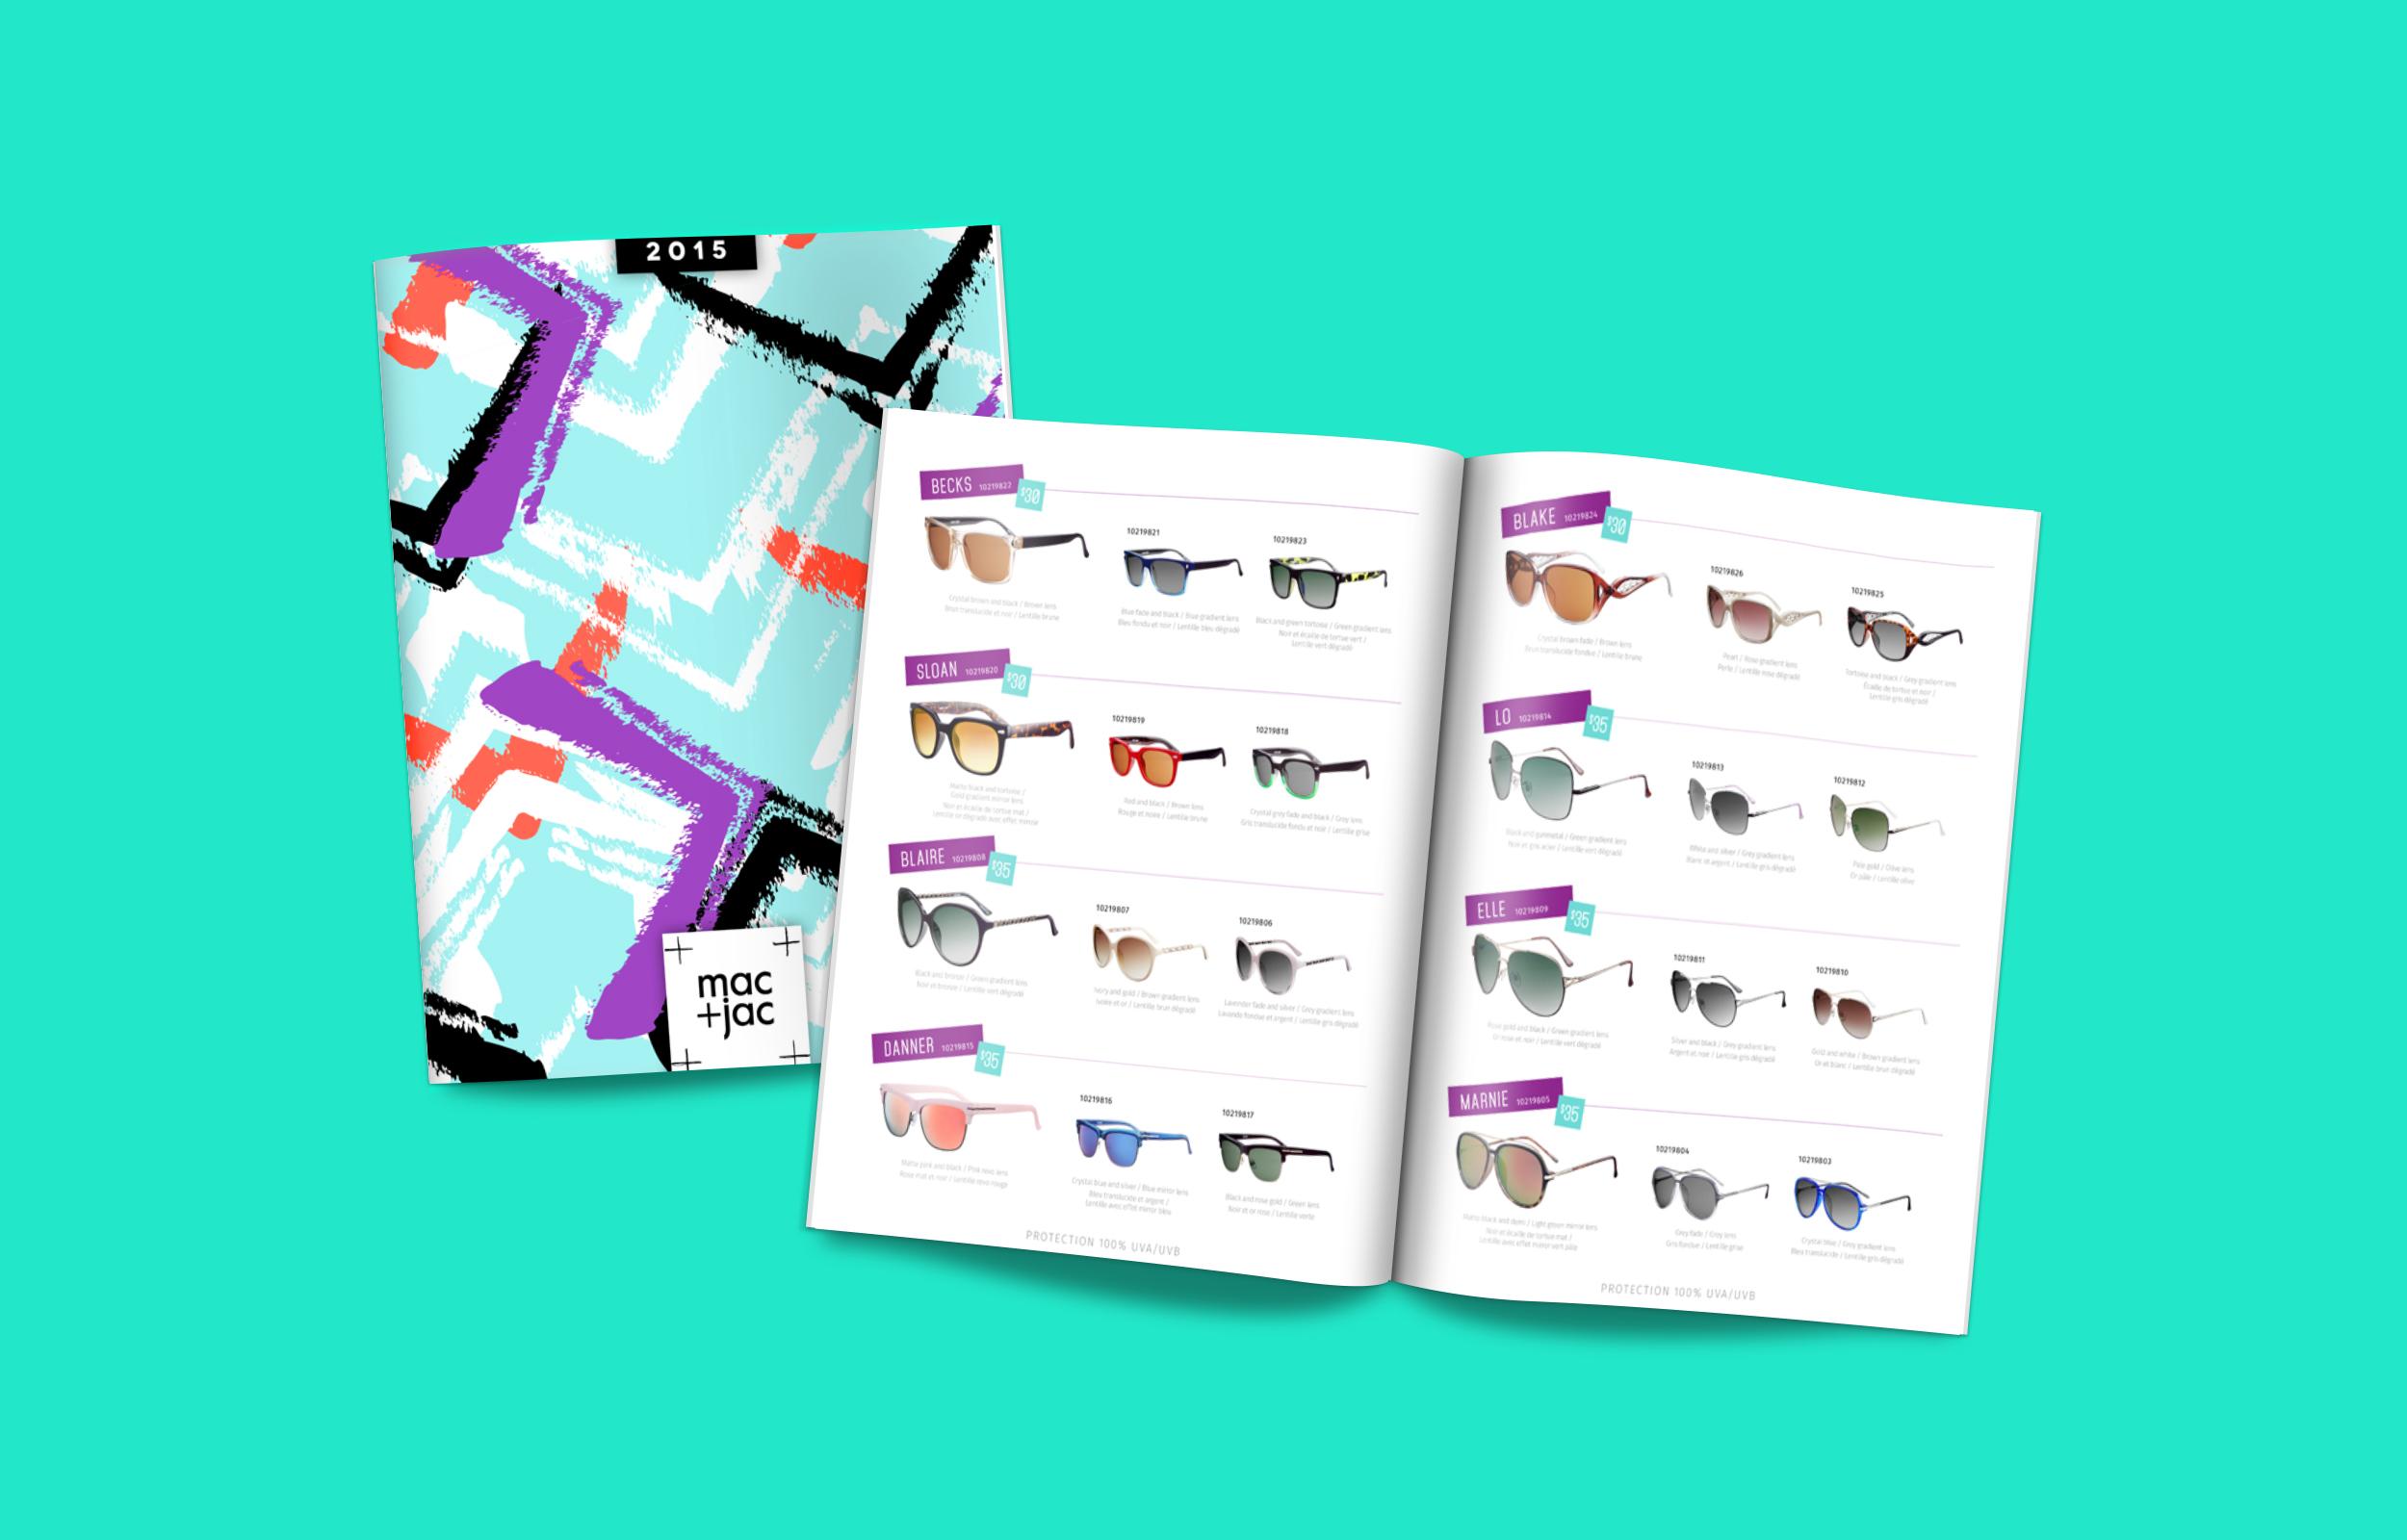 mac+jac linelist/catalogue design